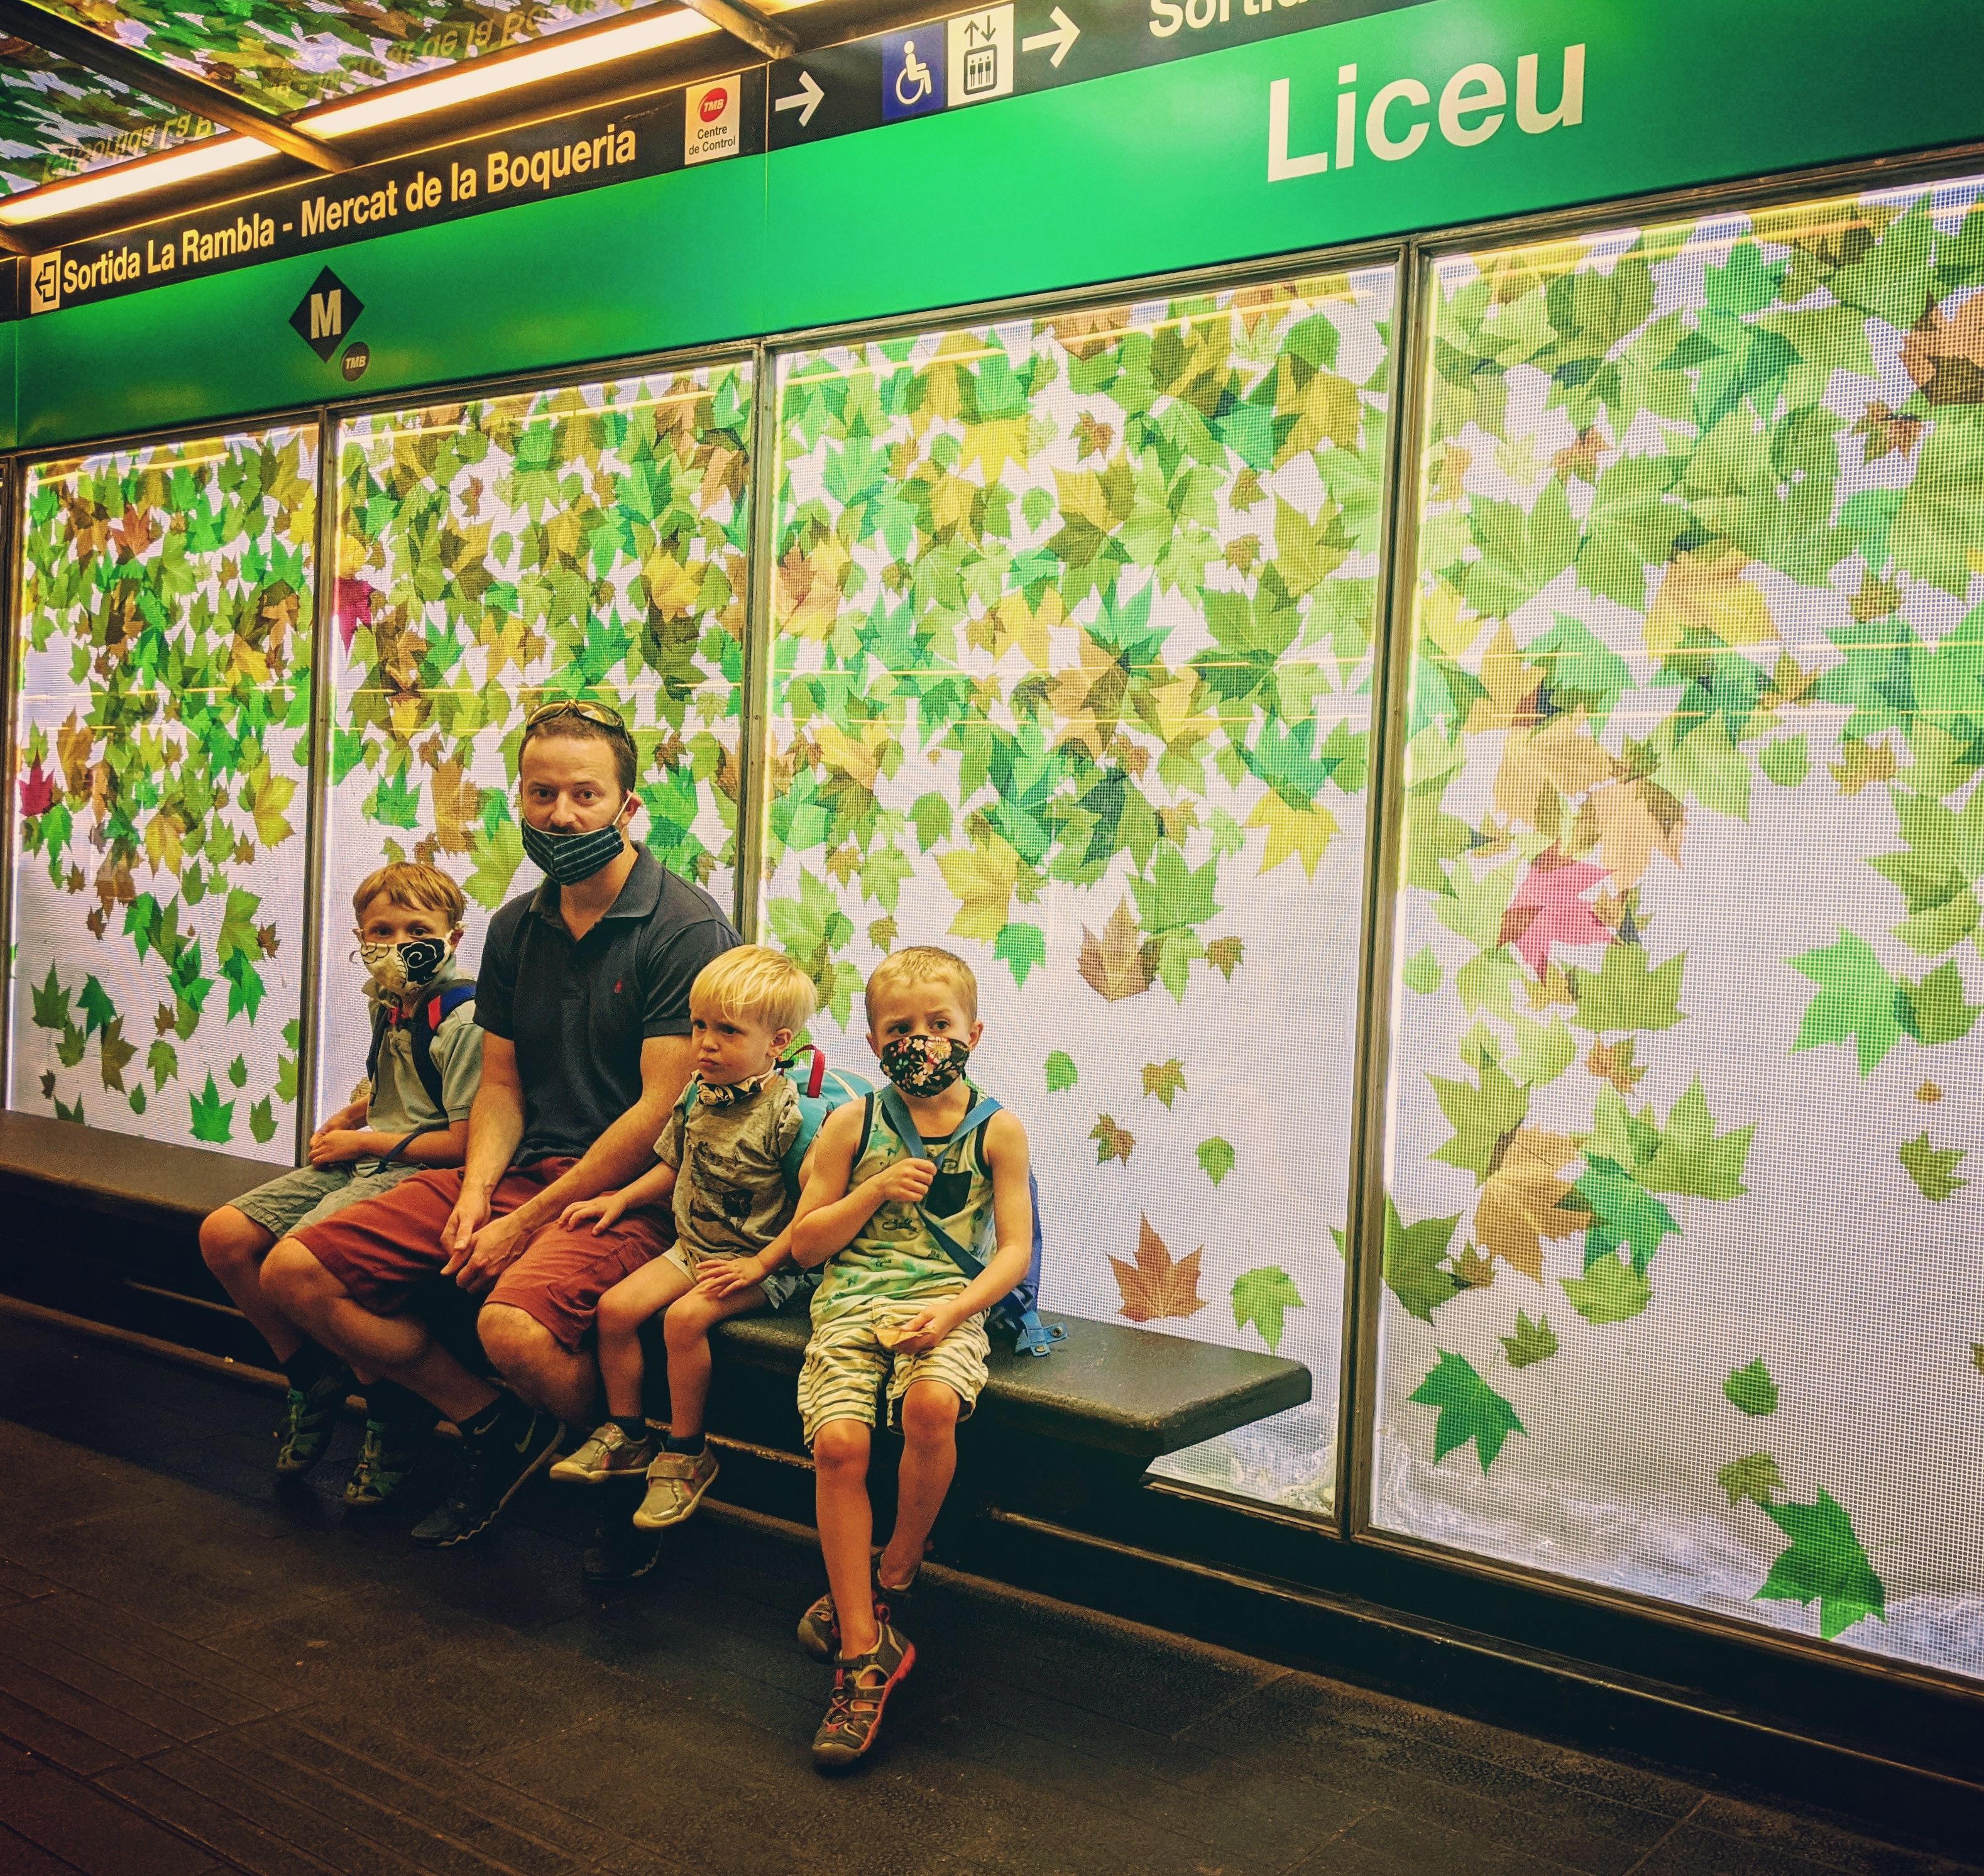 Liceu Metro Station, Barcelona